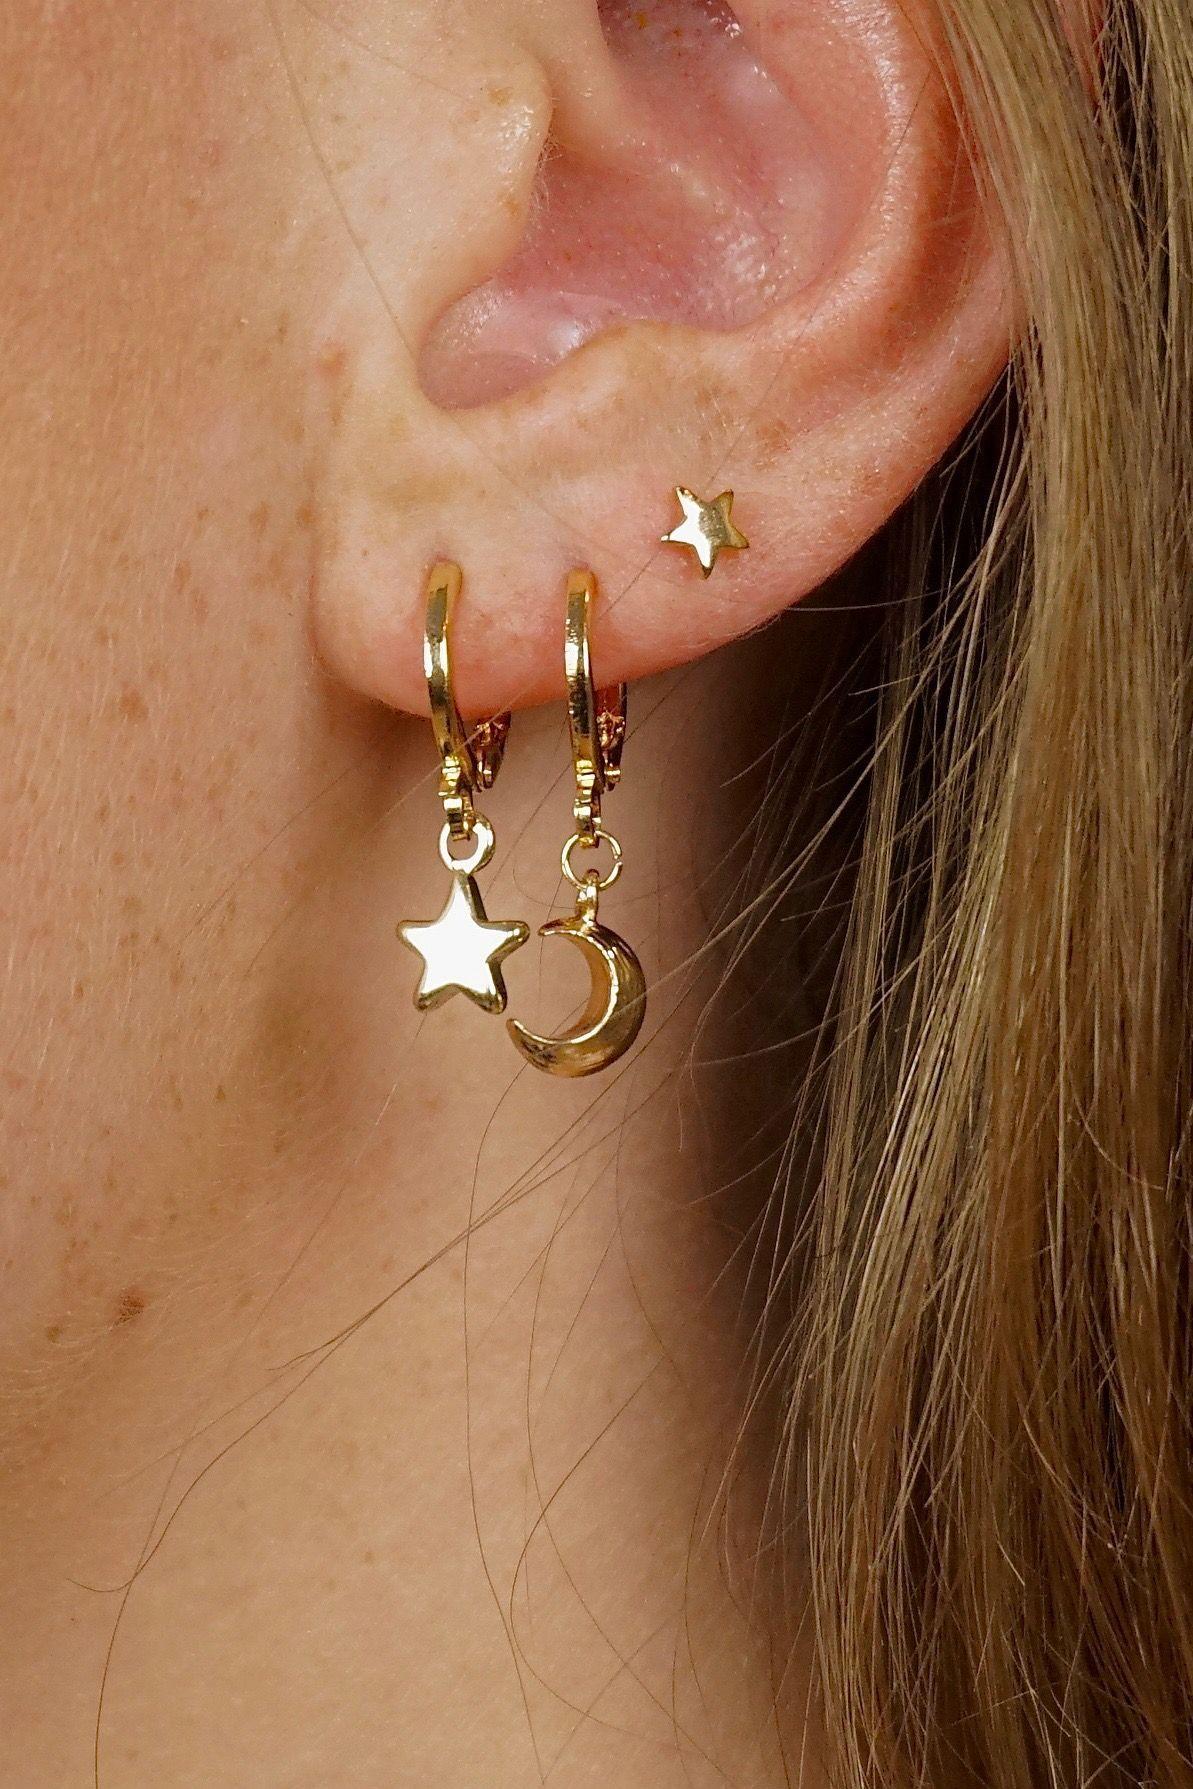 Crystal Shape 24 carat Gold Plated Earrings Surgical Steel Ear Piercing Studs